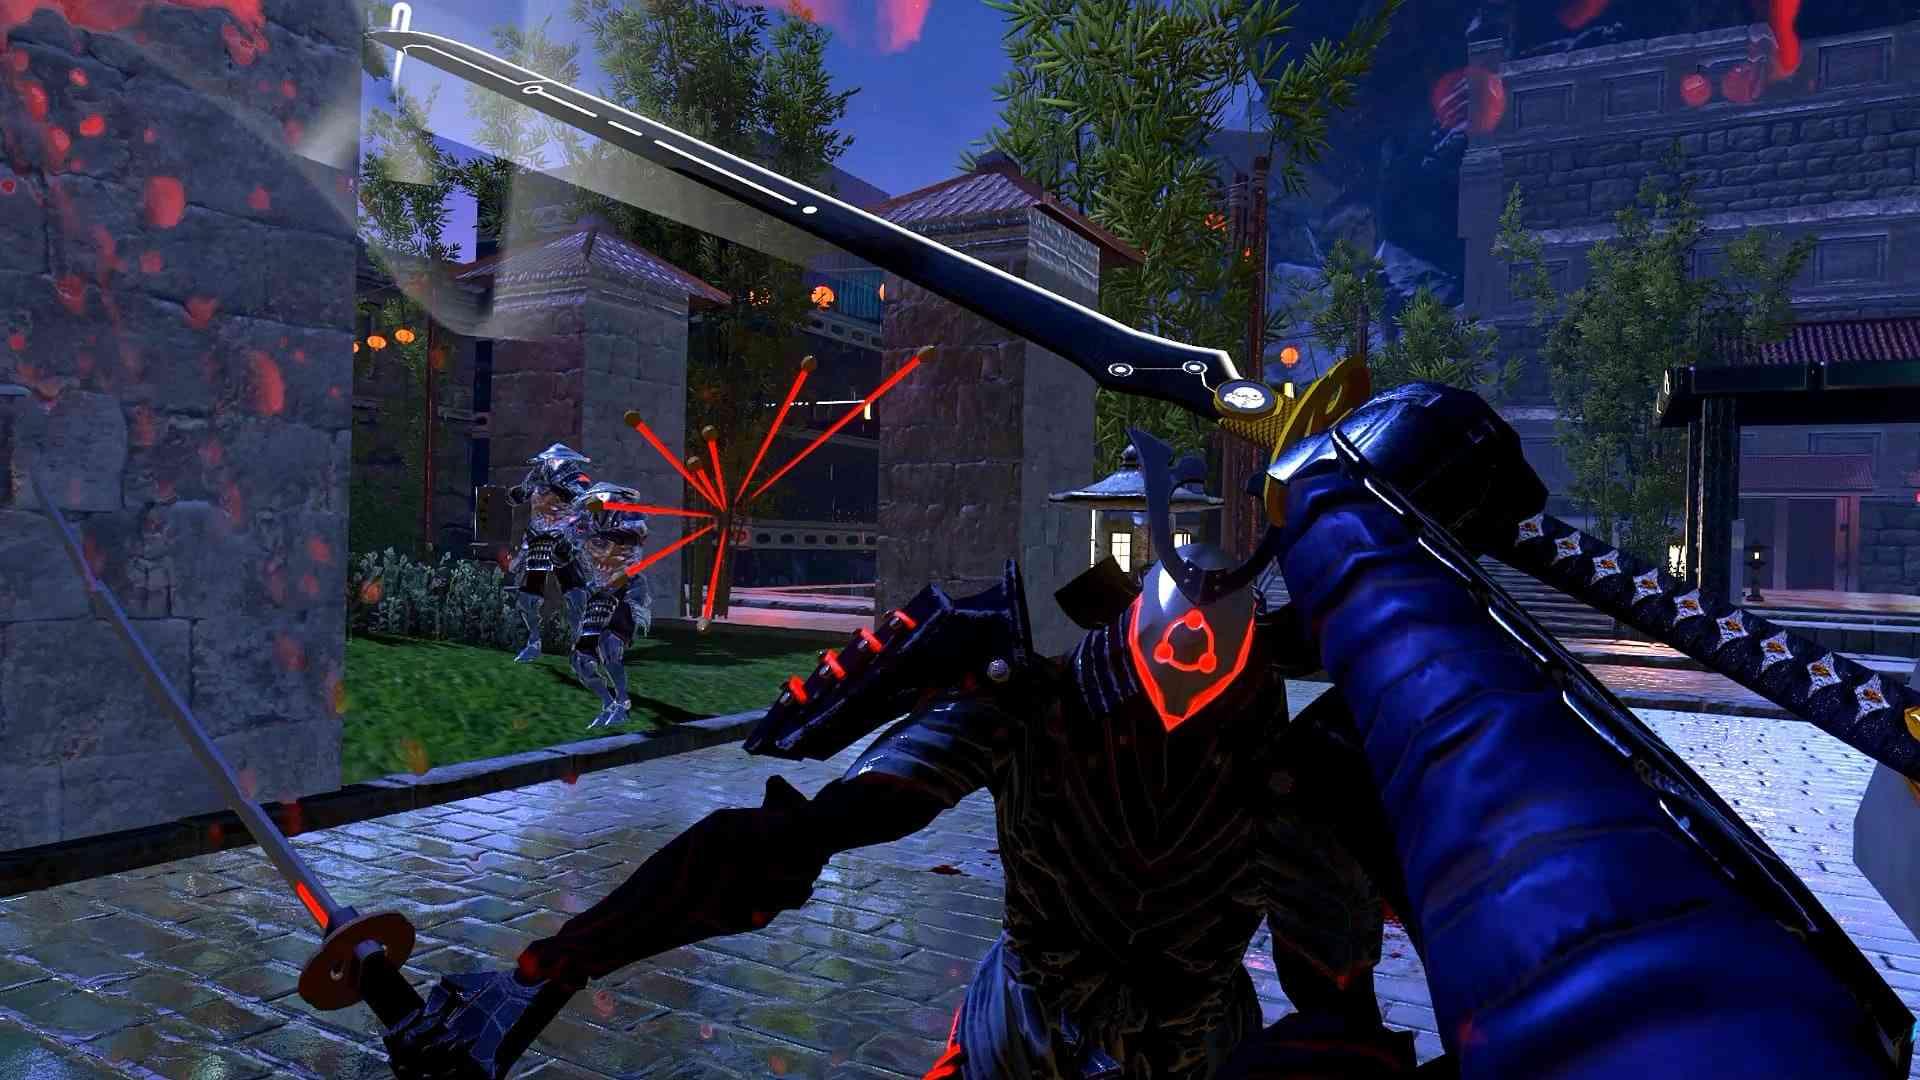 3d alien shooter game download